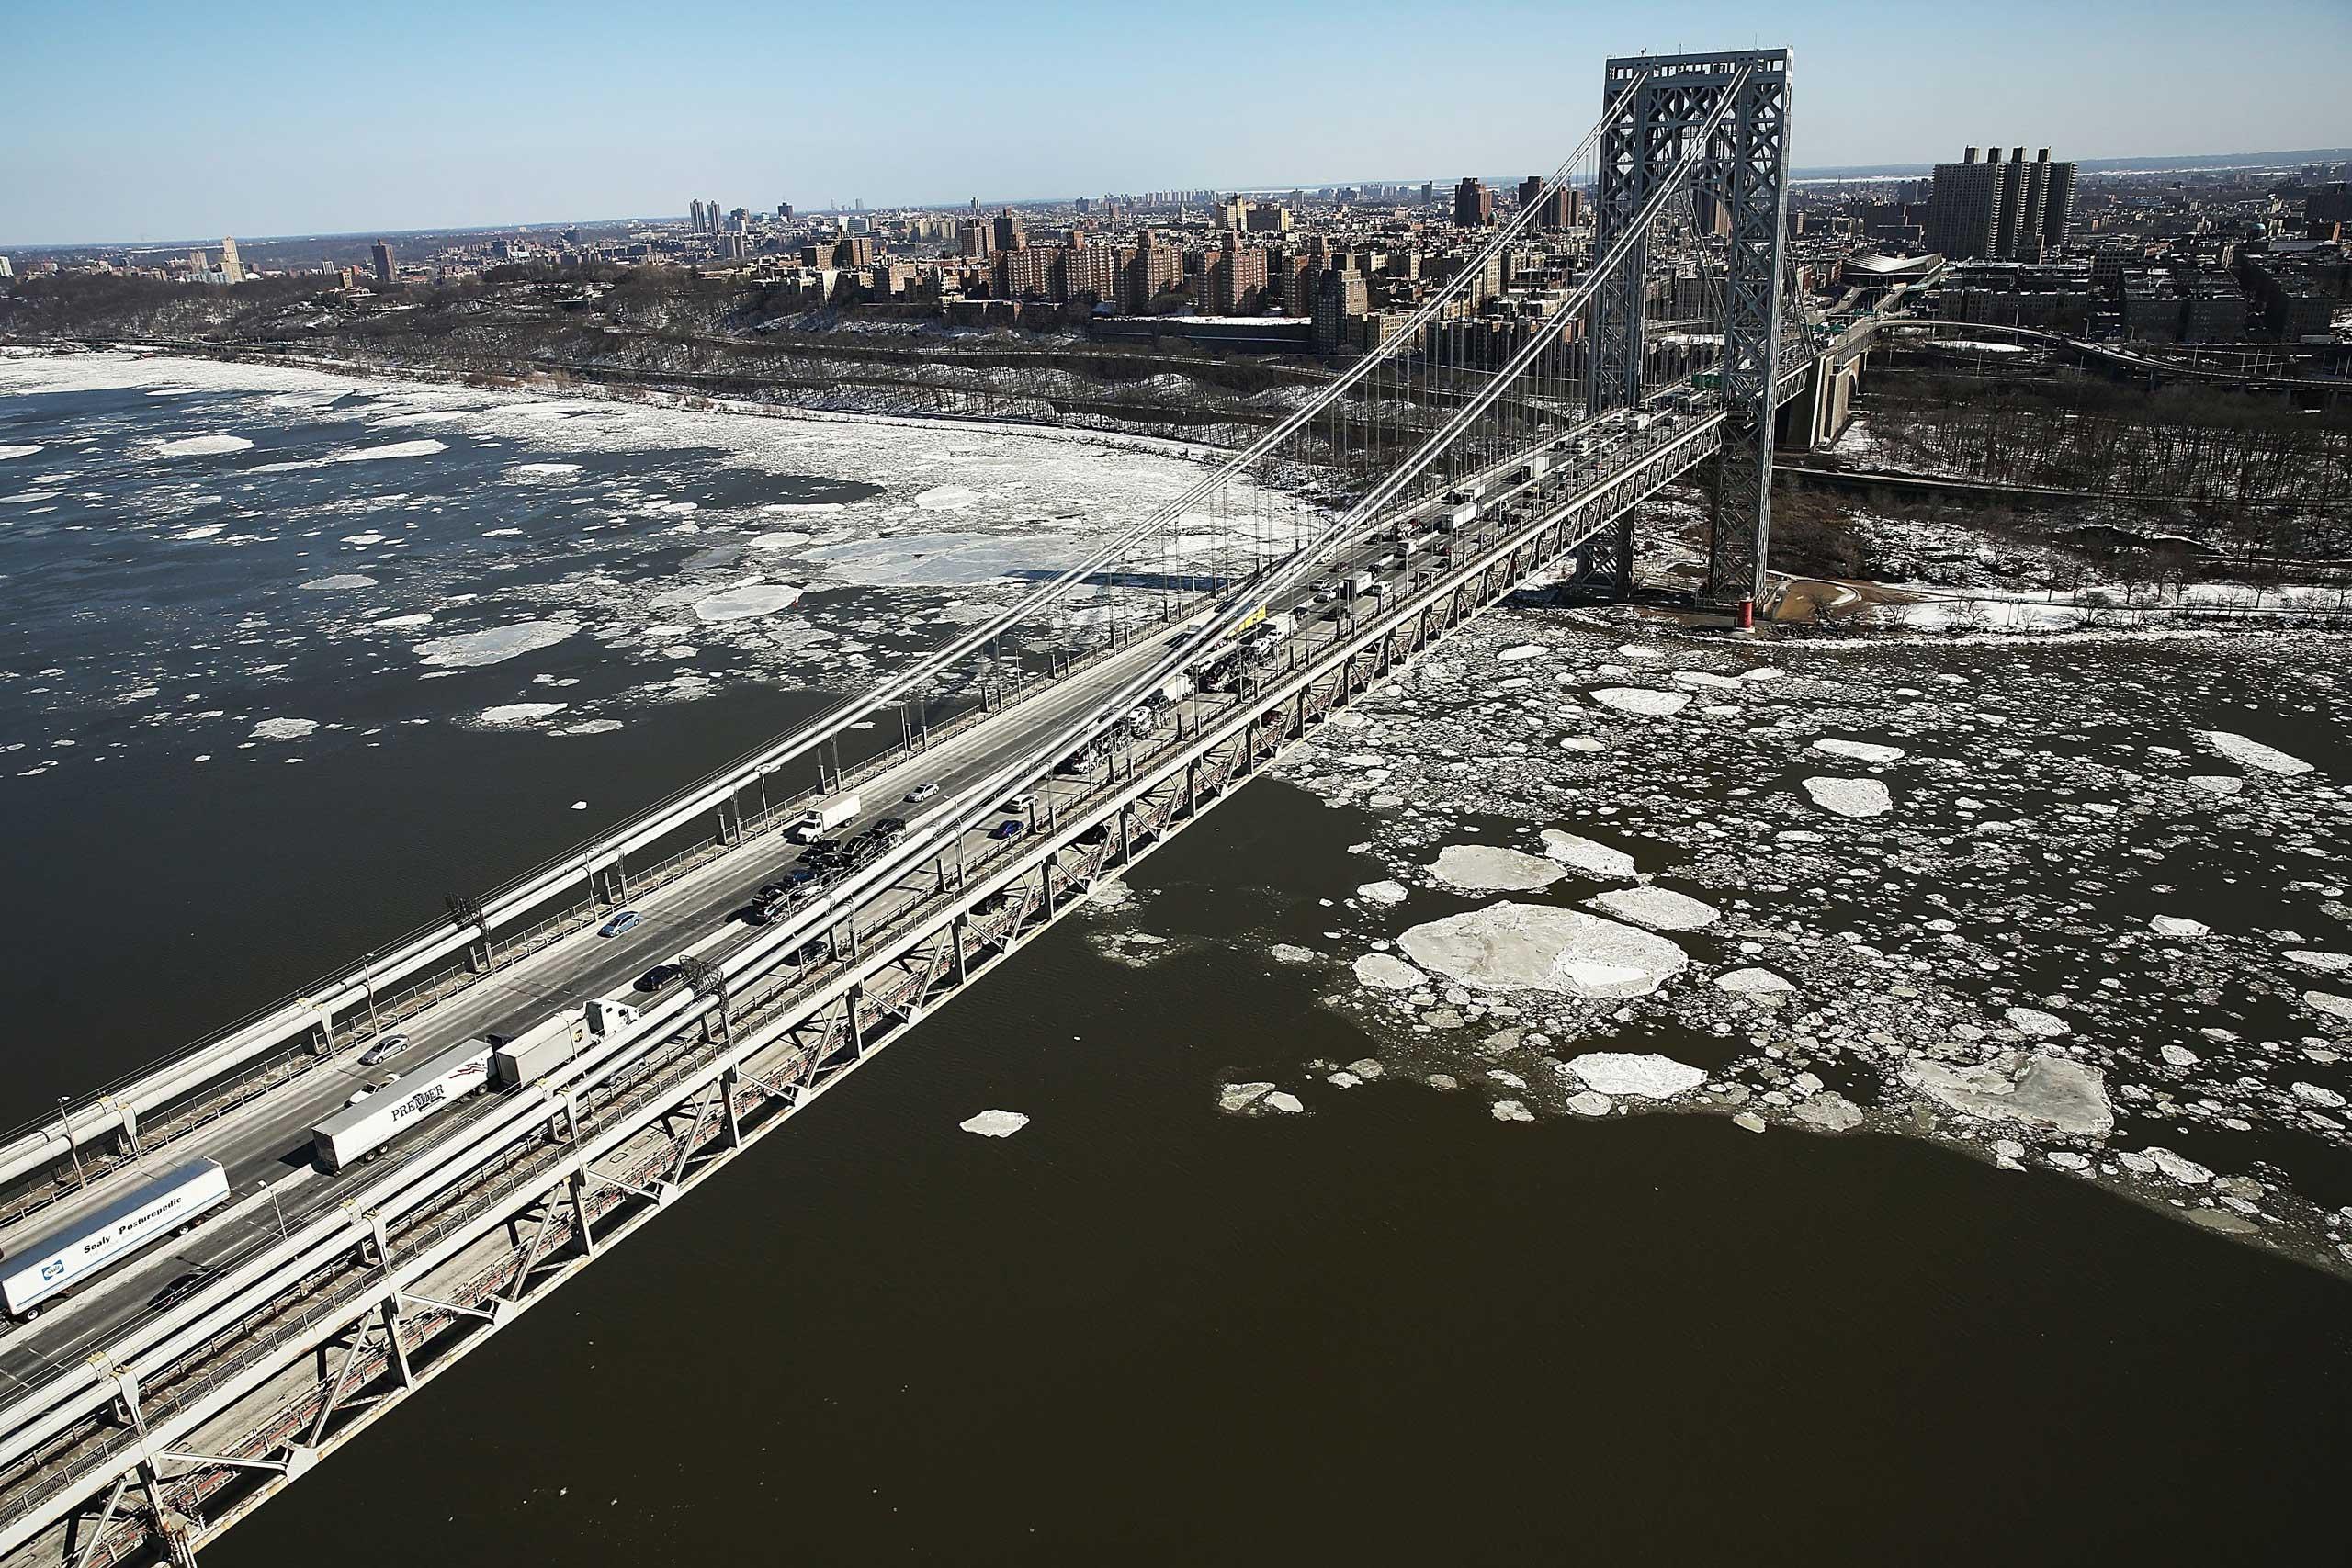 Ice flows along the Hudson River near the George Washington Bridge on Feb. 20, 2015 in New York City.